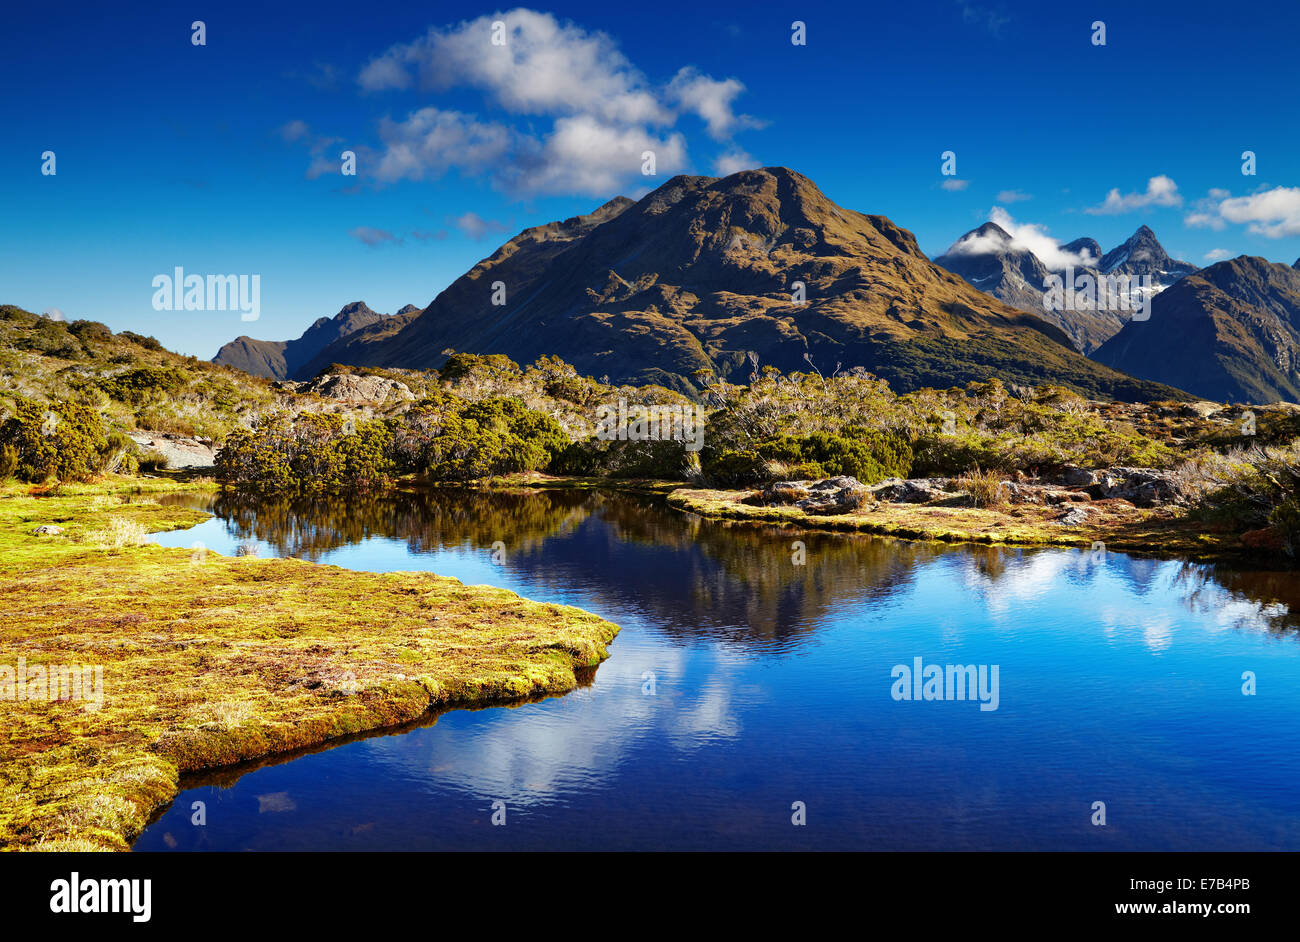 Kleiner See bei Key Summit, Routeburn Track, Neuseeland Stockbild